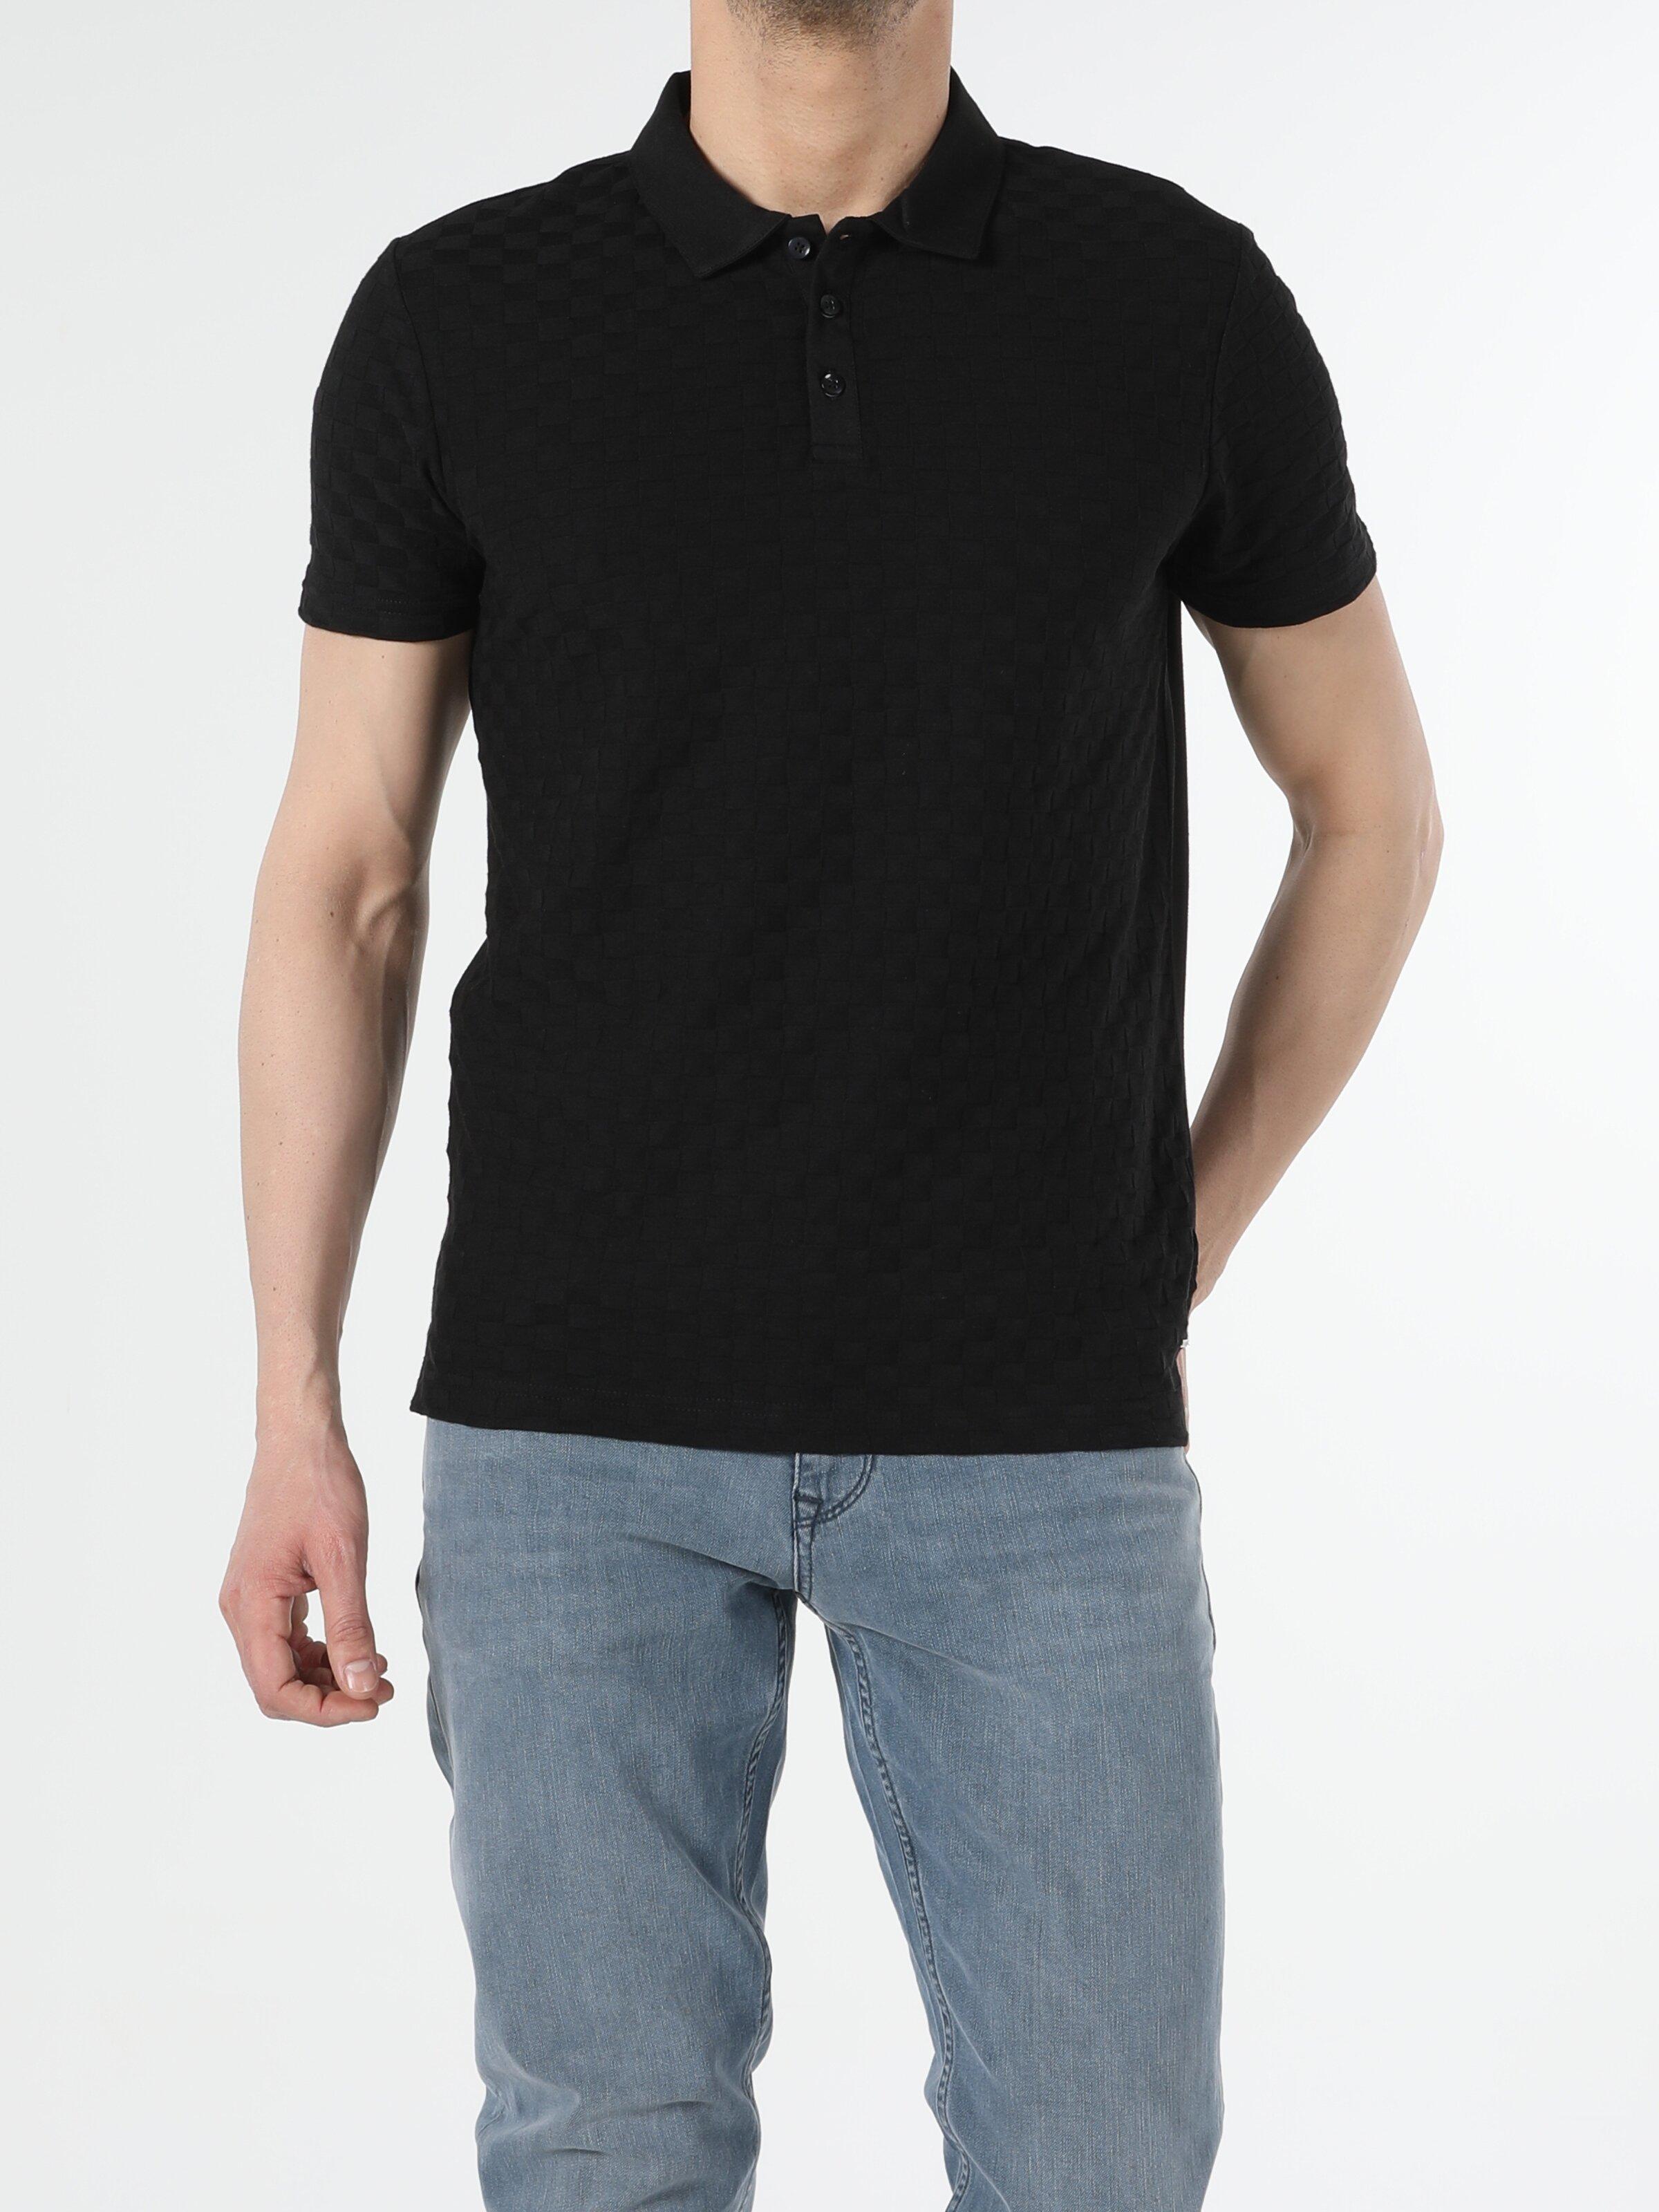 Siyah Regular Fit Polo Yaka Erkek Kısa Kol Polo Tişört